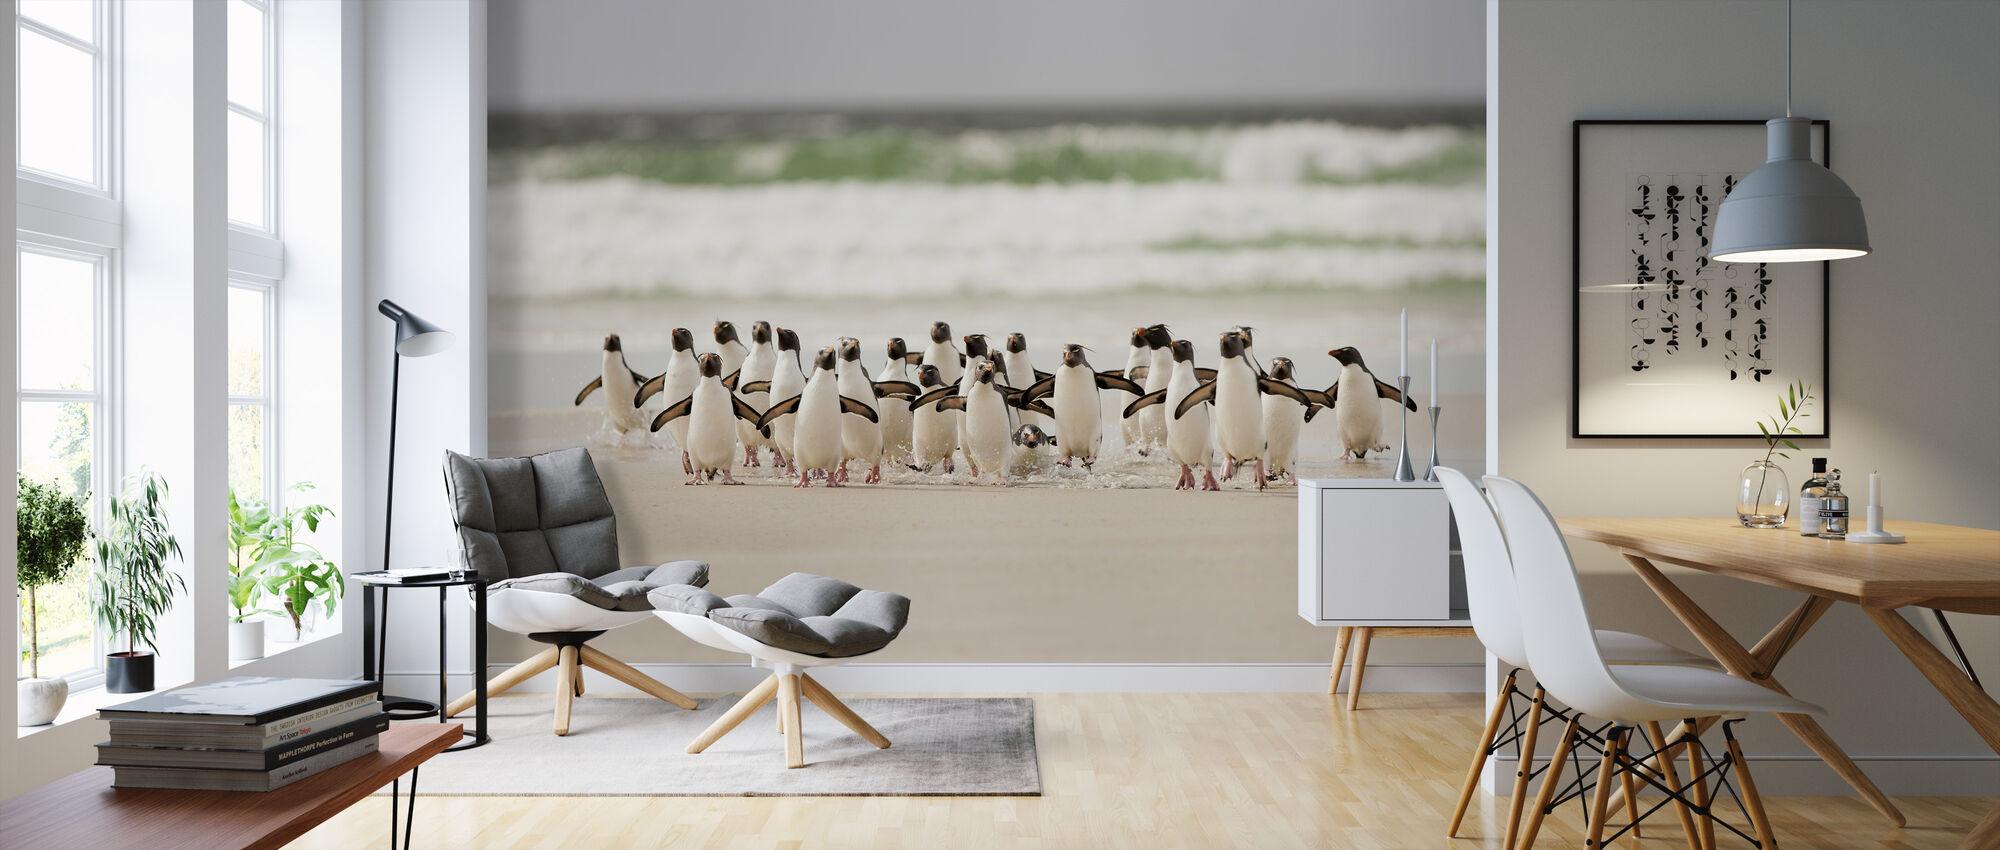 Landing - Wallpaper - Living Room